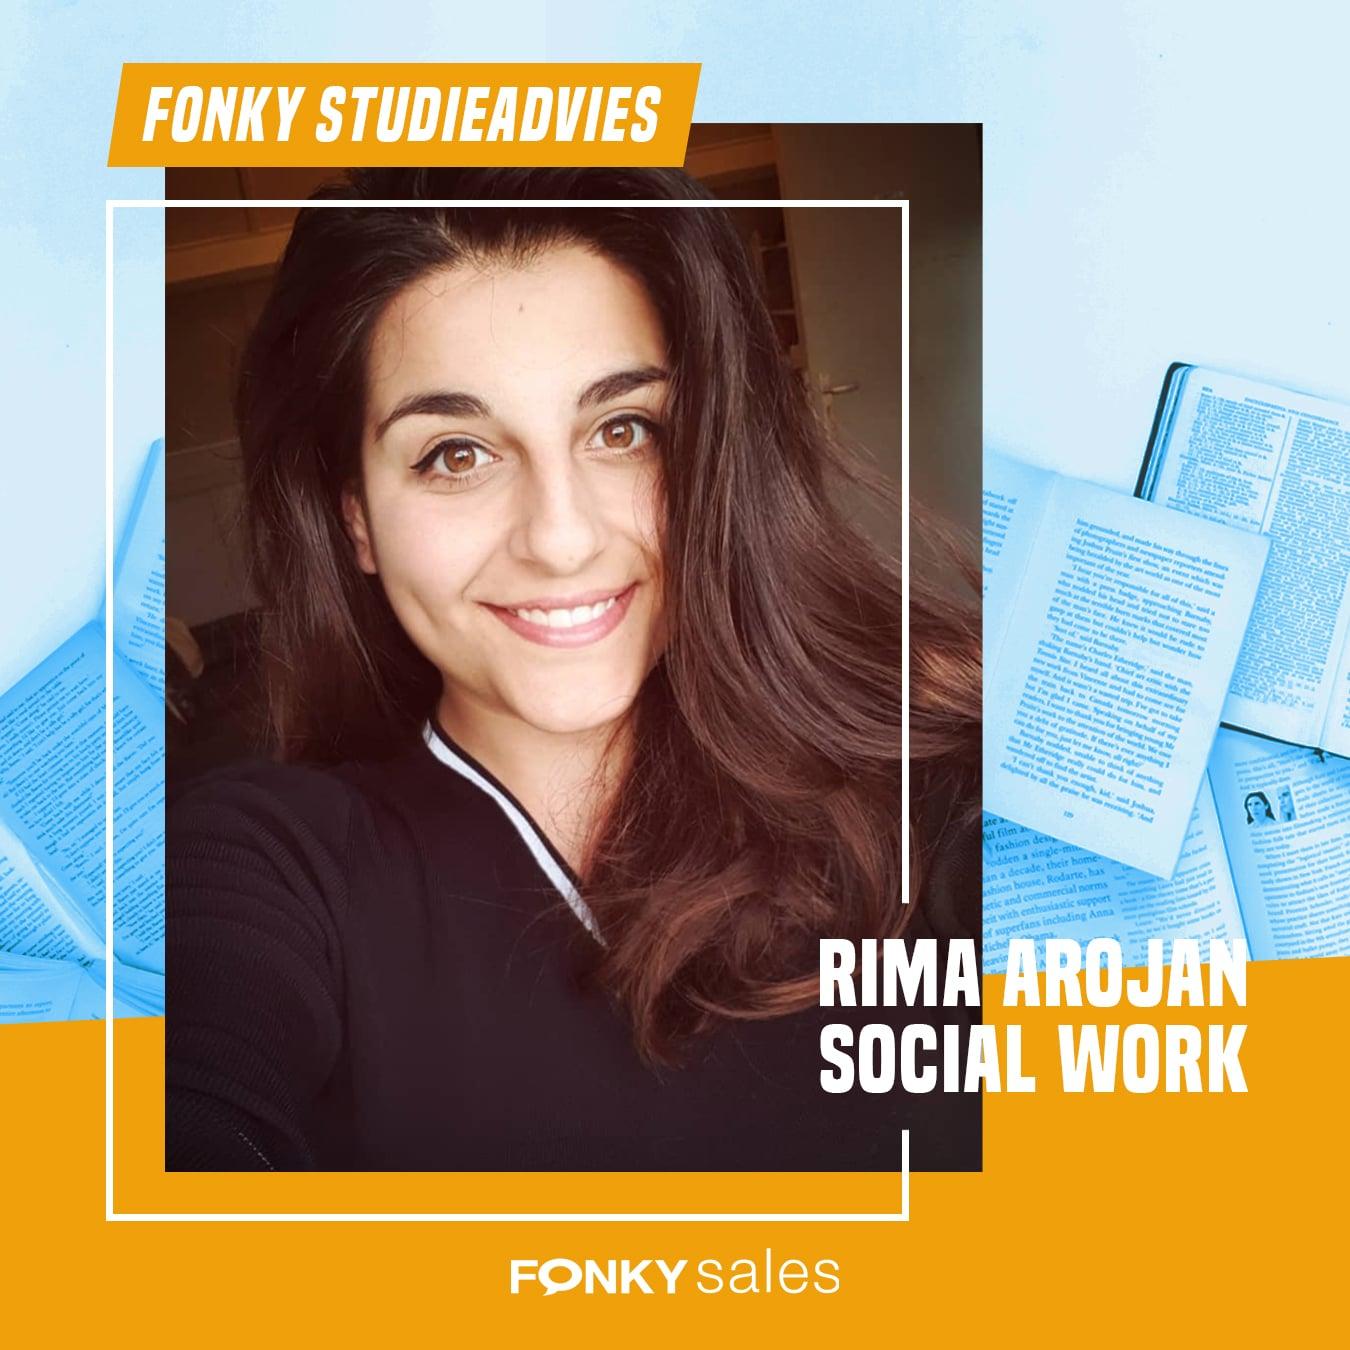 Studieadvies Social Work Rima Arojan